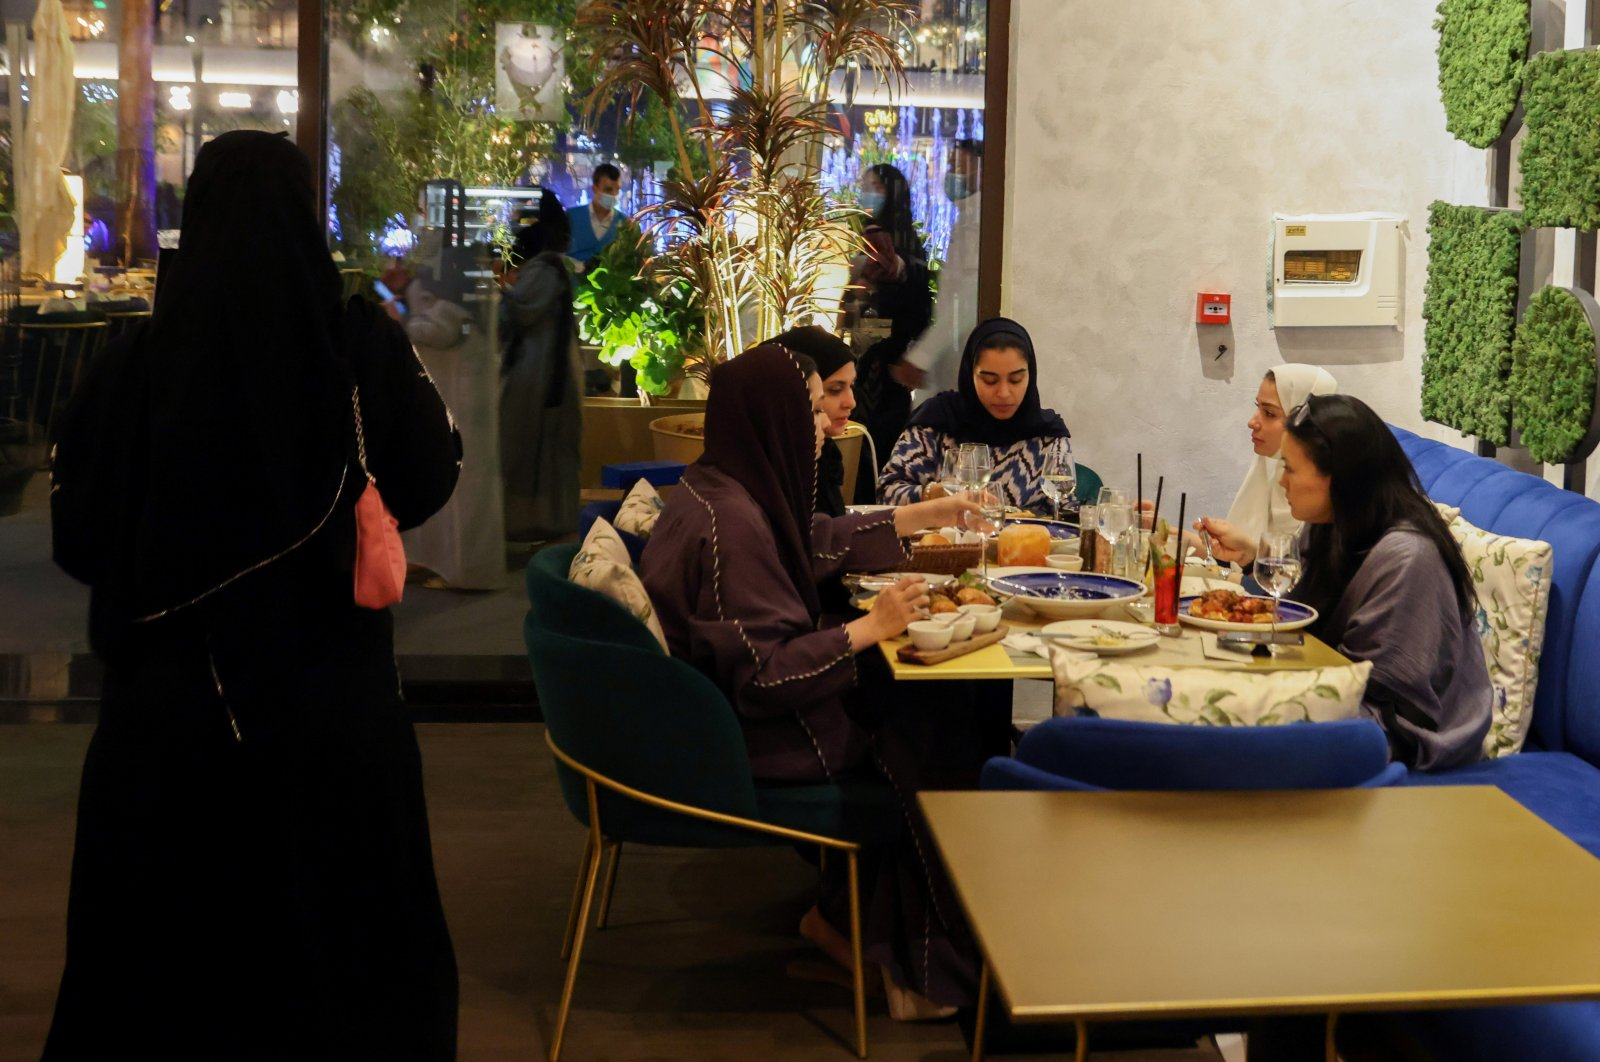 Saudi women sit at David Burke's restaurant, in The Zone restaurant complex, in Riyadh, Saudi Arabia, Aug. 25, 2021. (Reuters Photo)